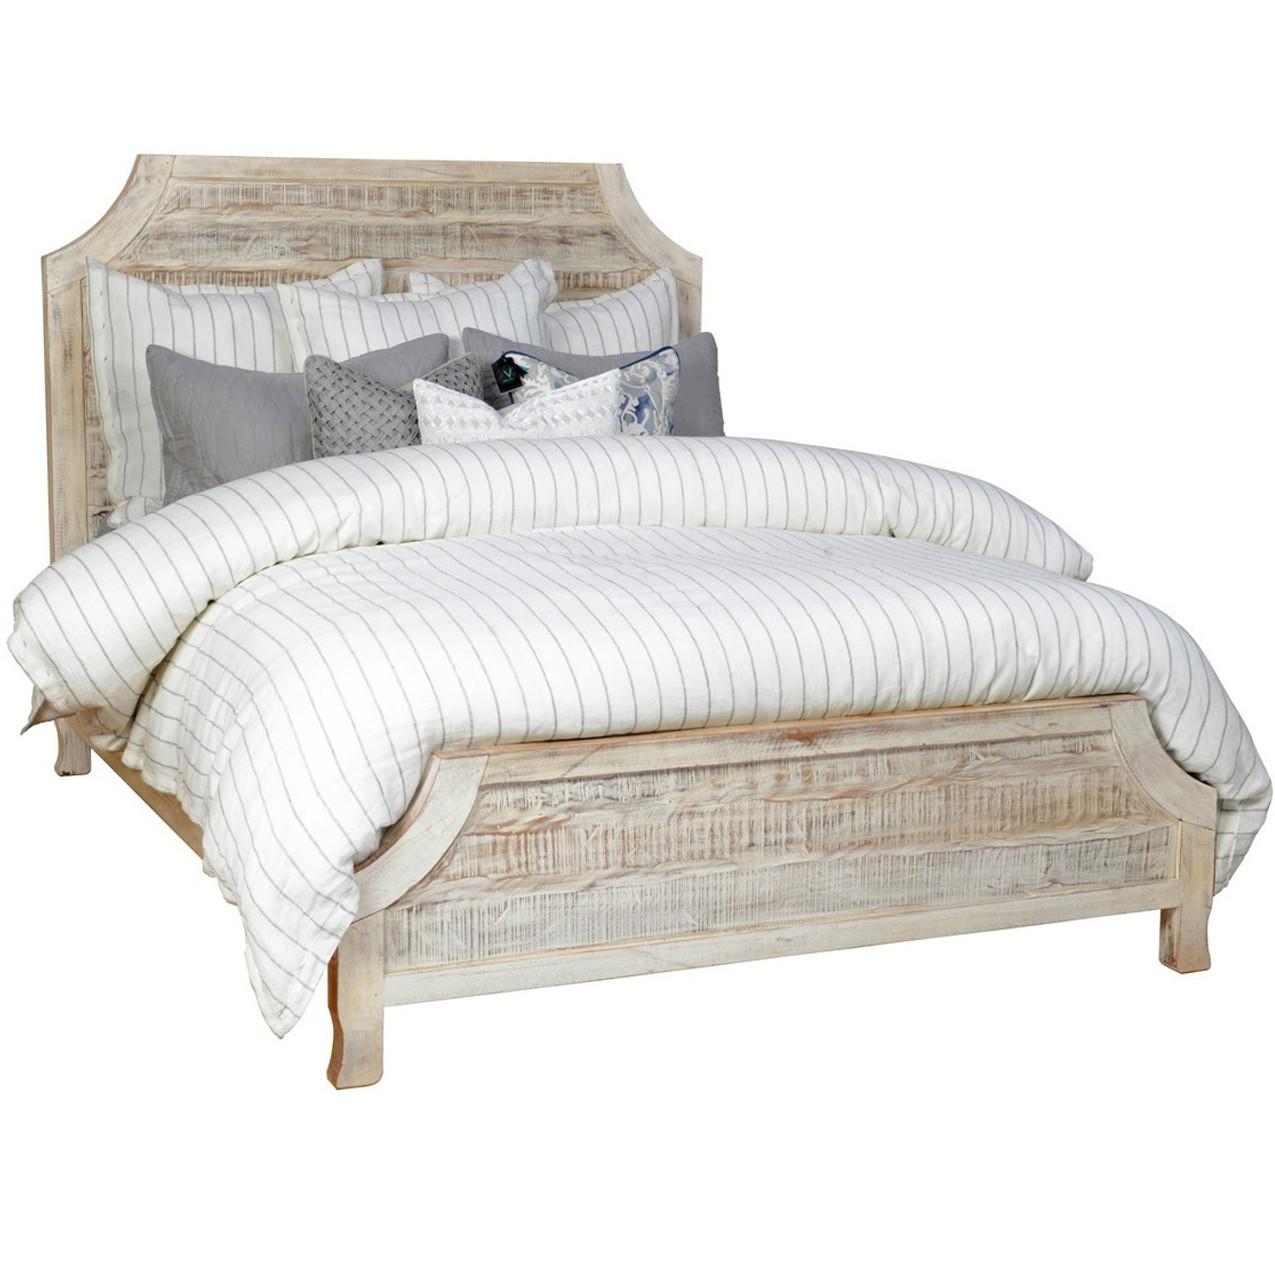 Rustic Reclaimed Wood Aria California King Bed   Zin Home